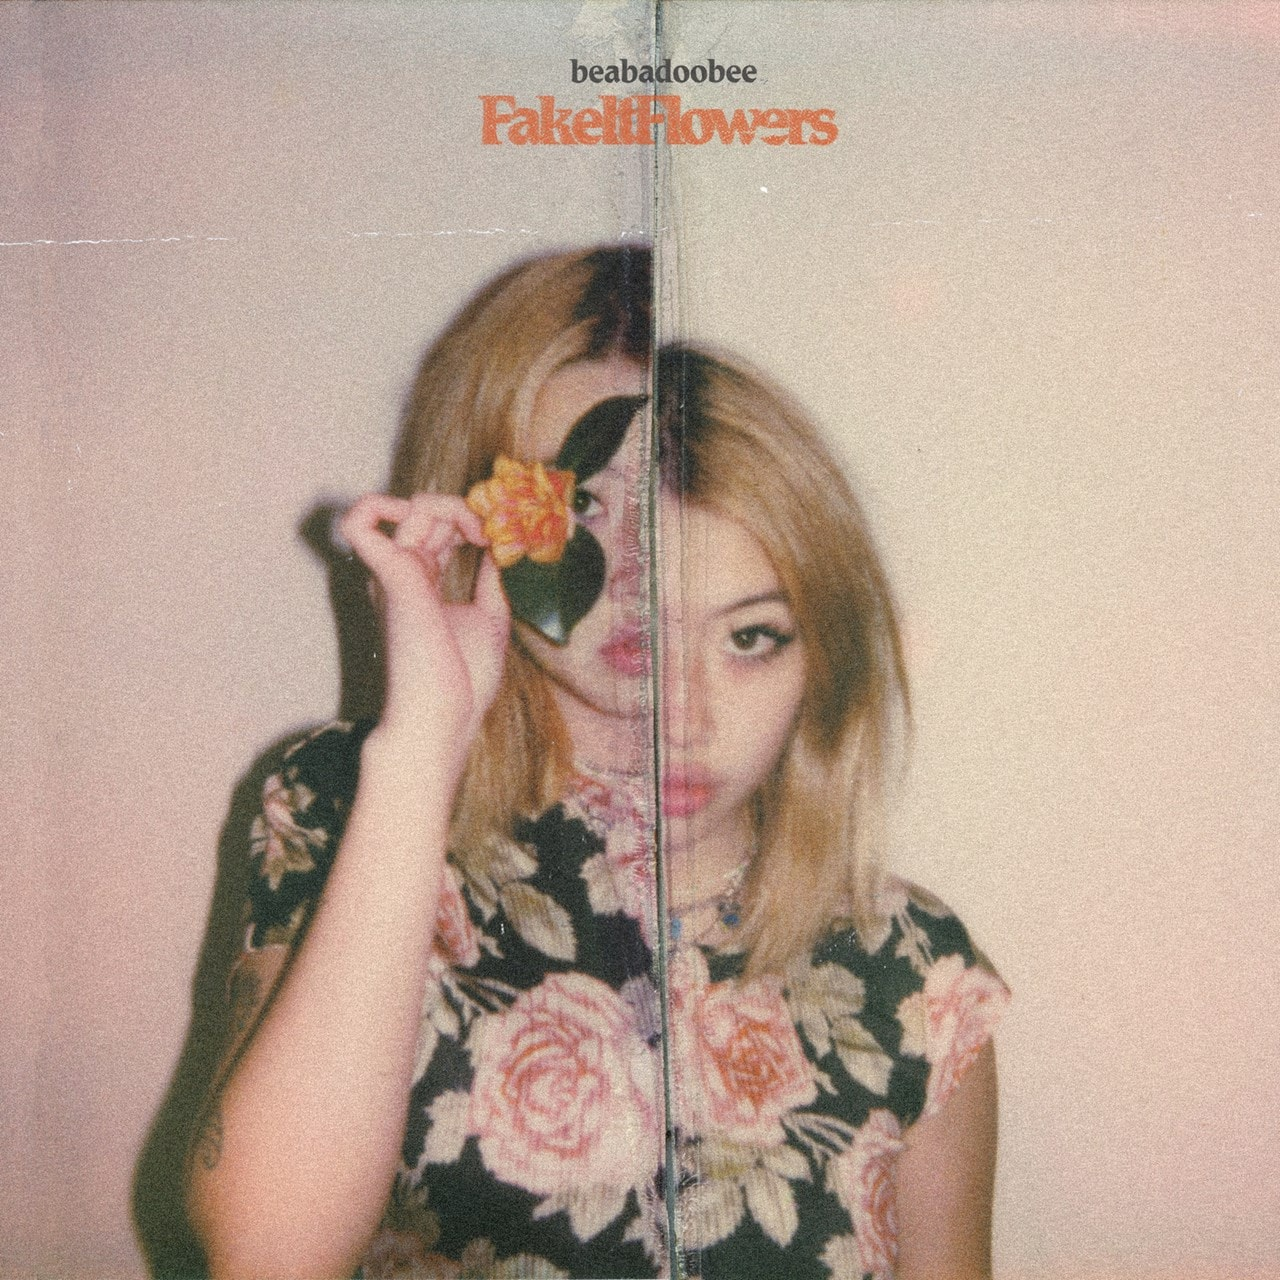 Fake It Flowers - 1